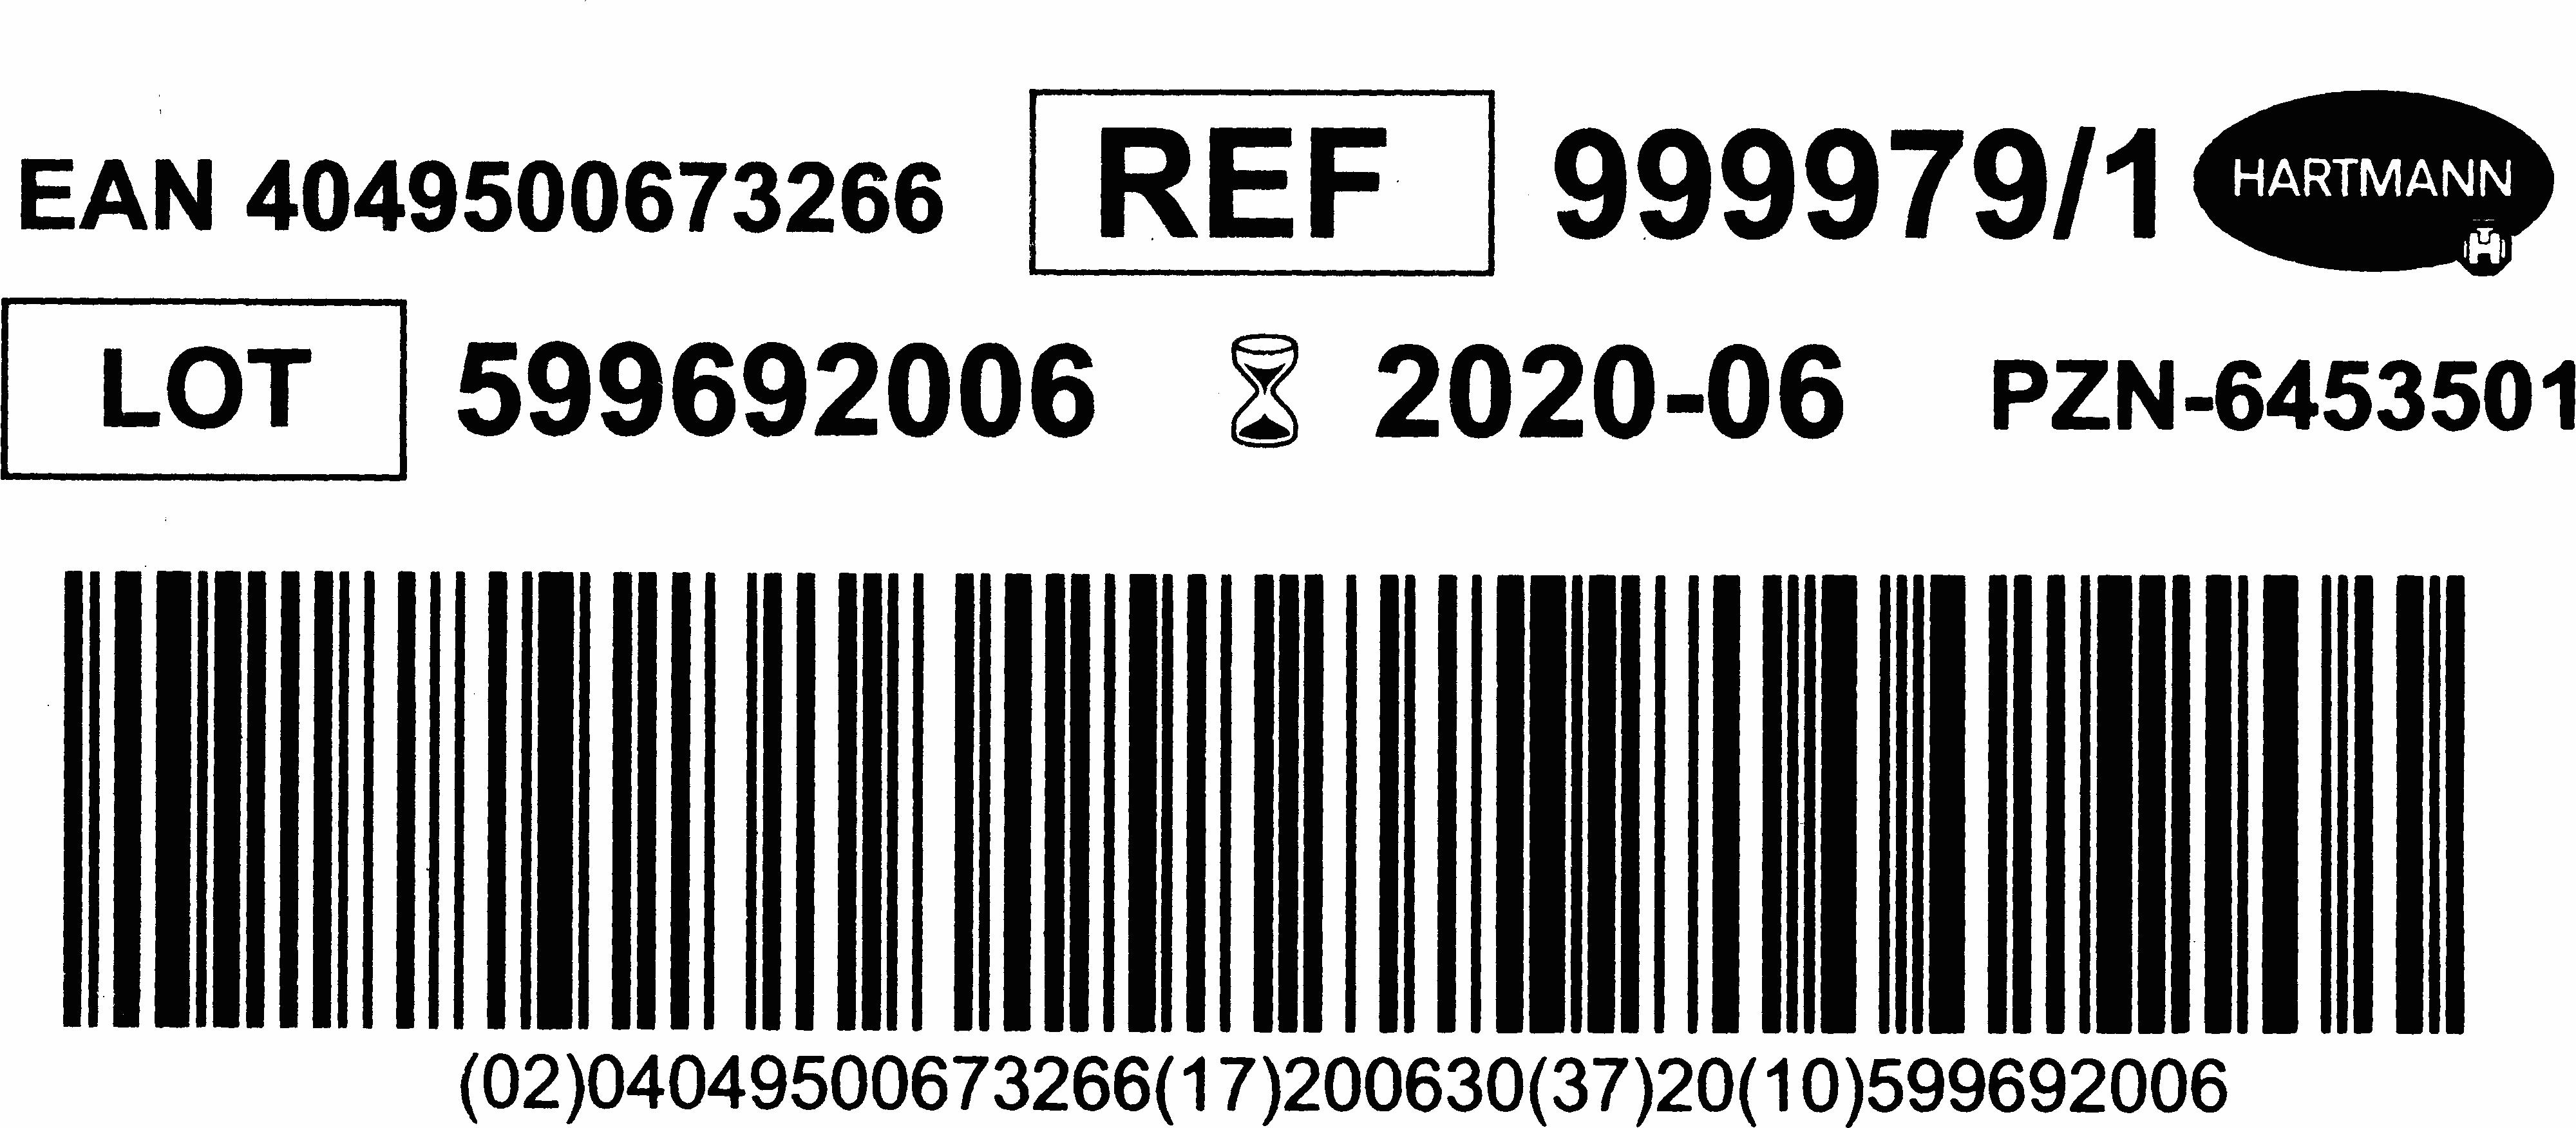 (02)04049500673266(17)200630(37)20(10)599692006